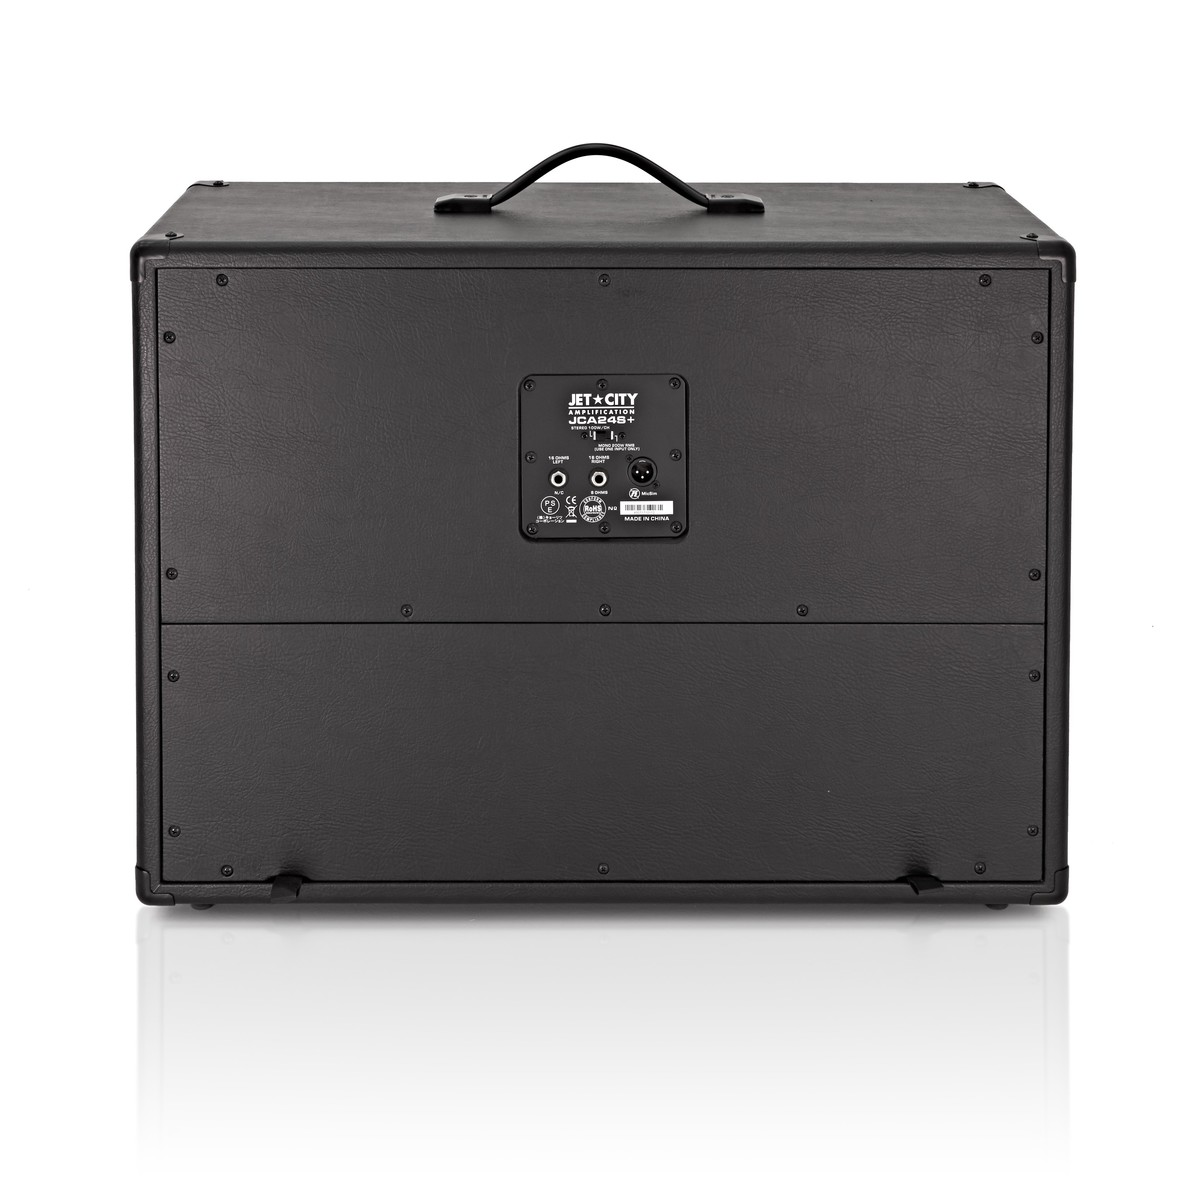 Jet City 24S+ 2x12 Speaker Cab at Gear4music